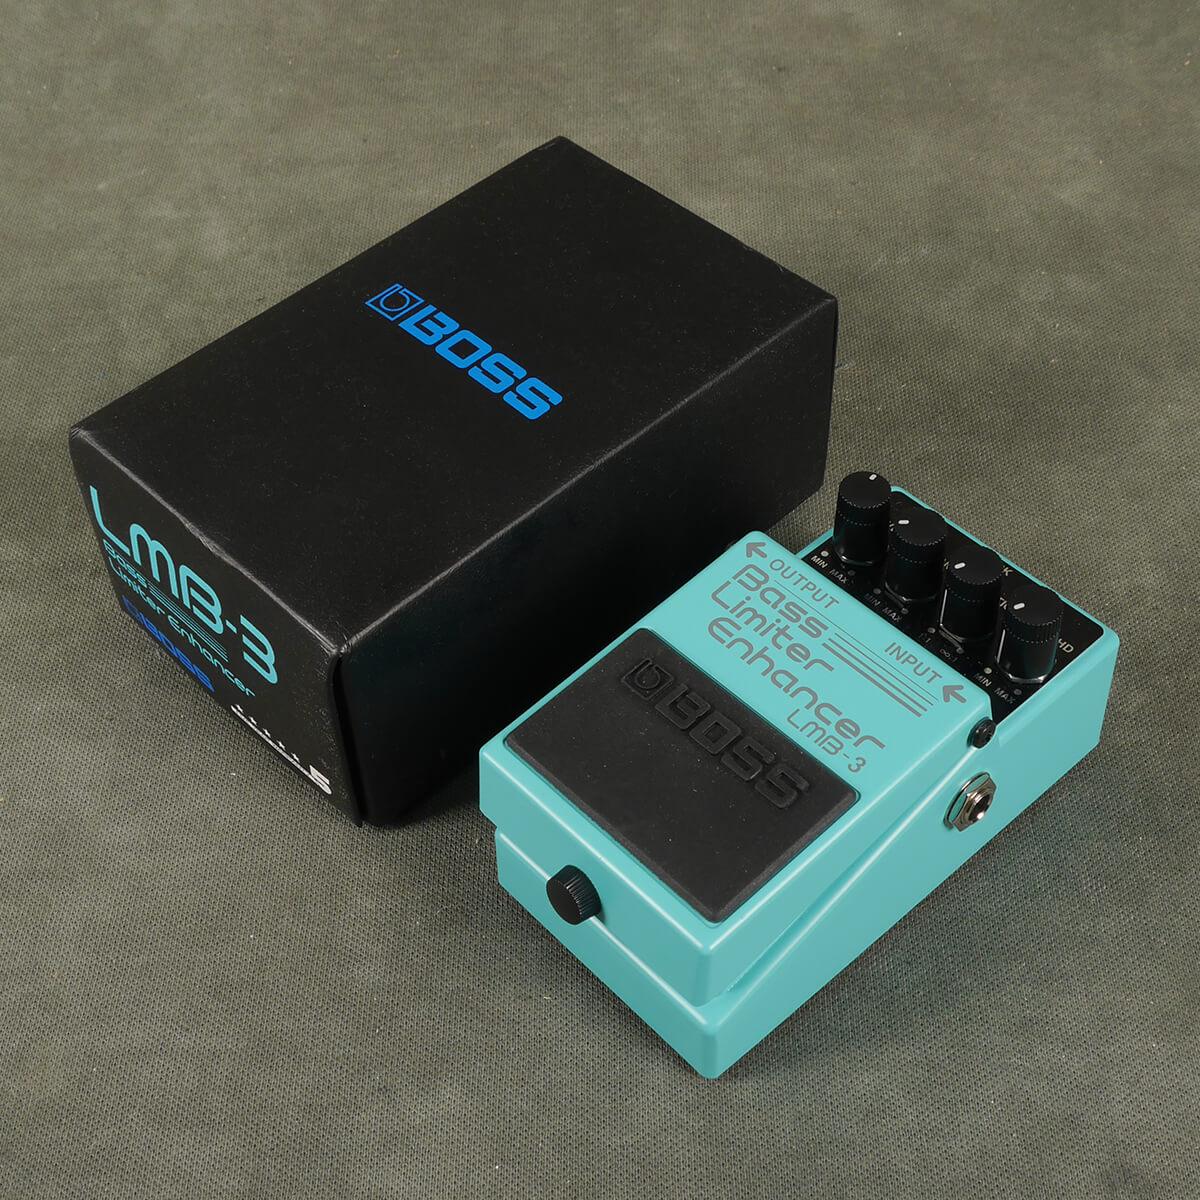 Boss LMB-3 Bass Limiter FX Pedal w/Box - 2nd Hand